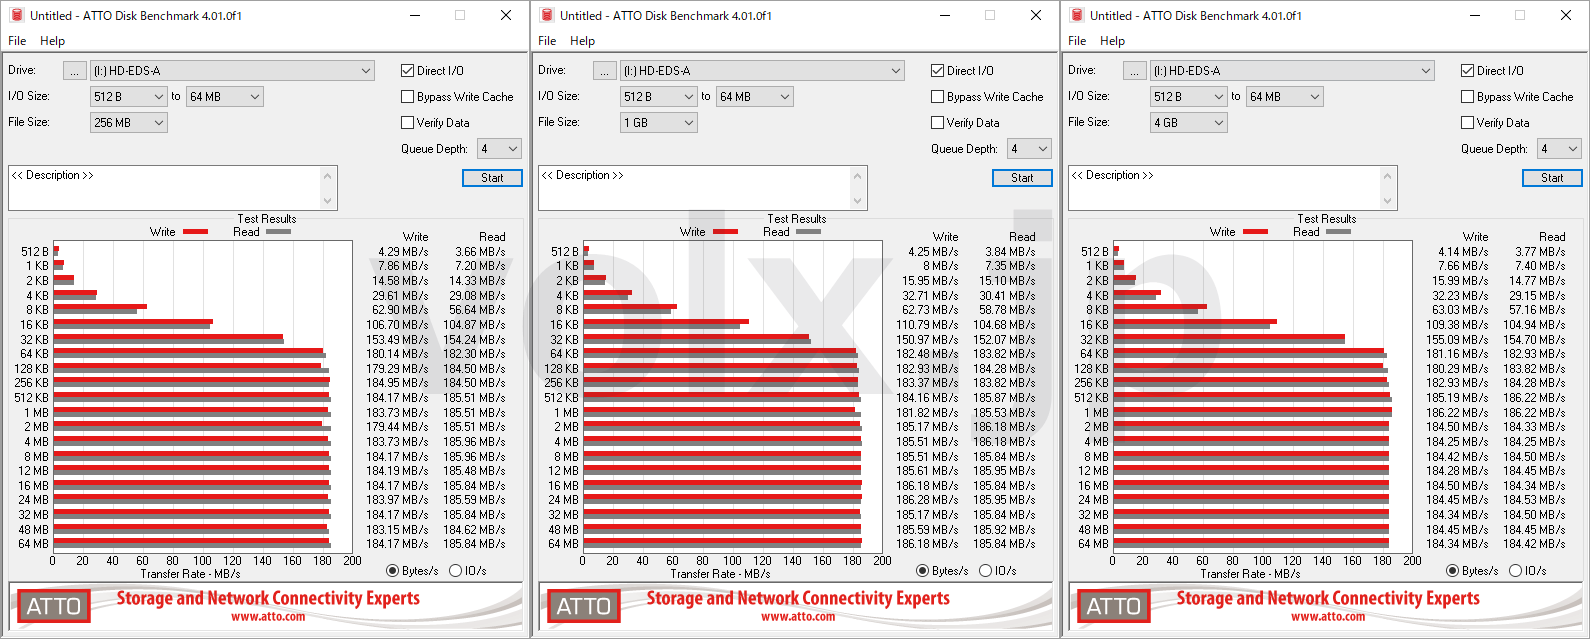 hd-eds40u3-ba-atto-disk-benchmark